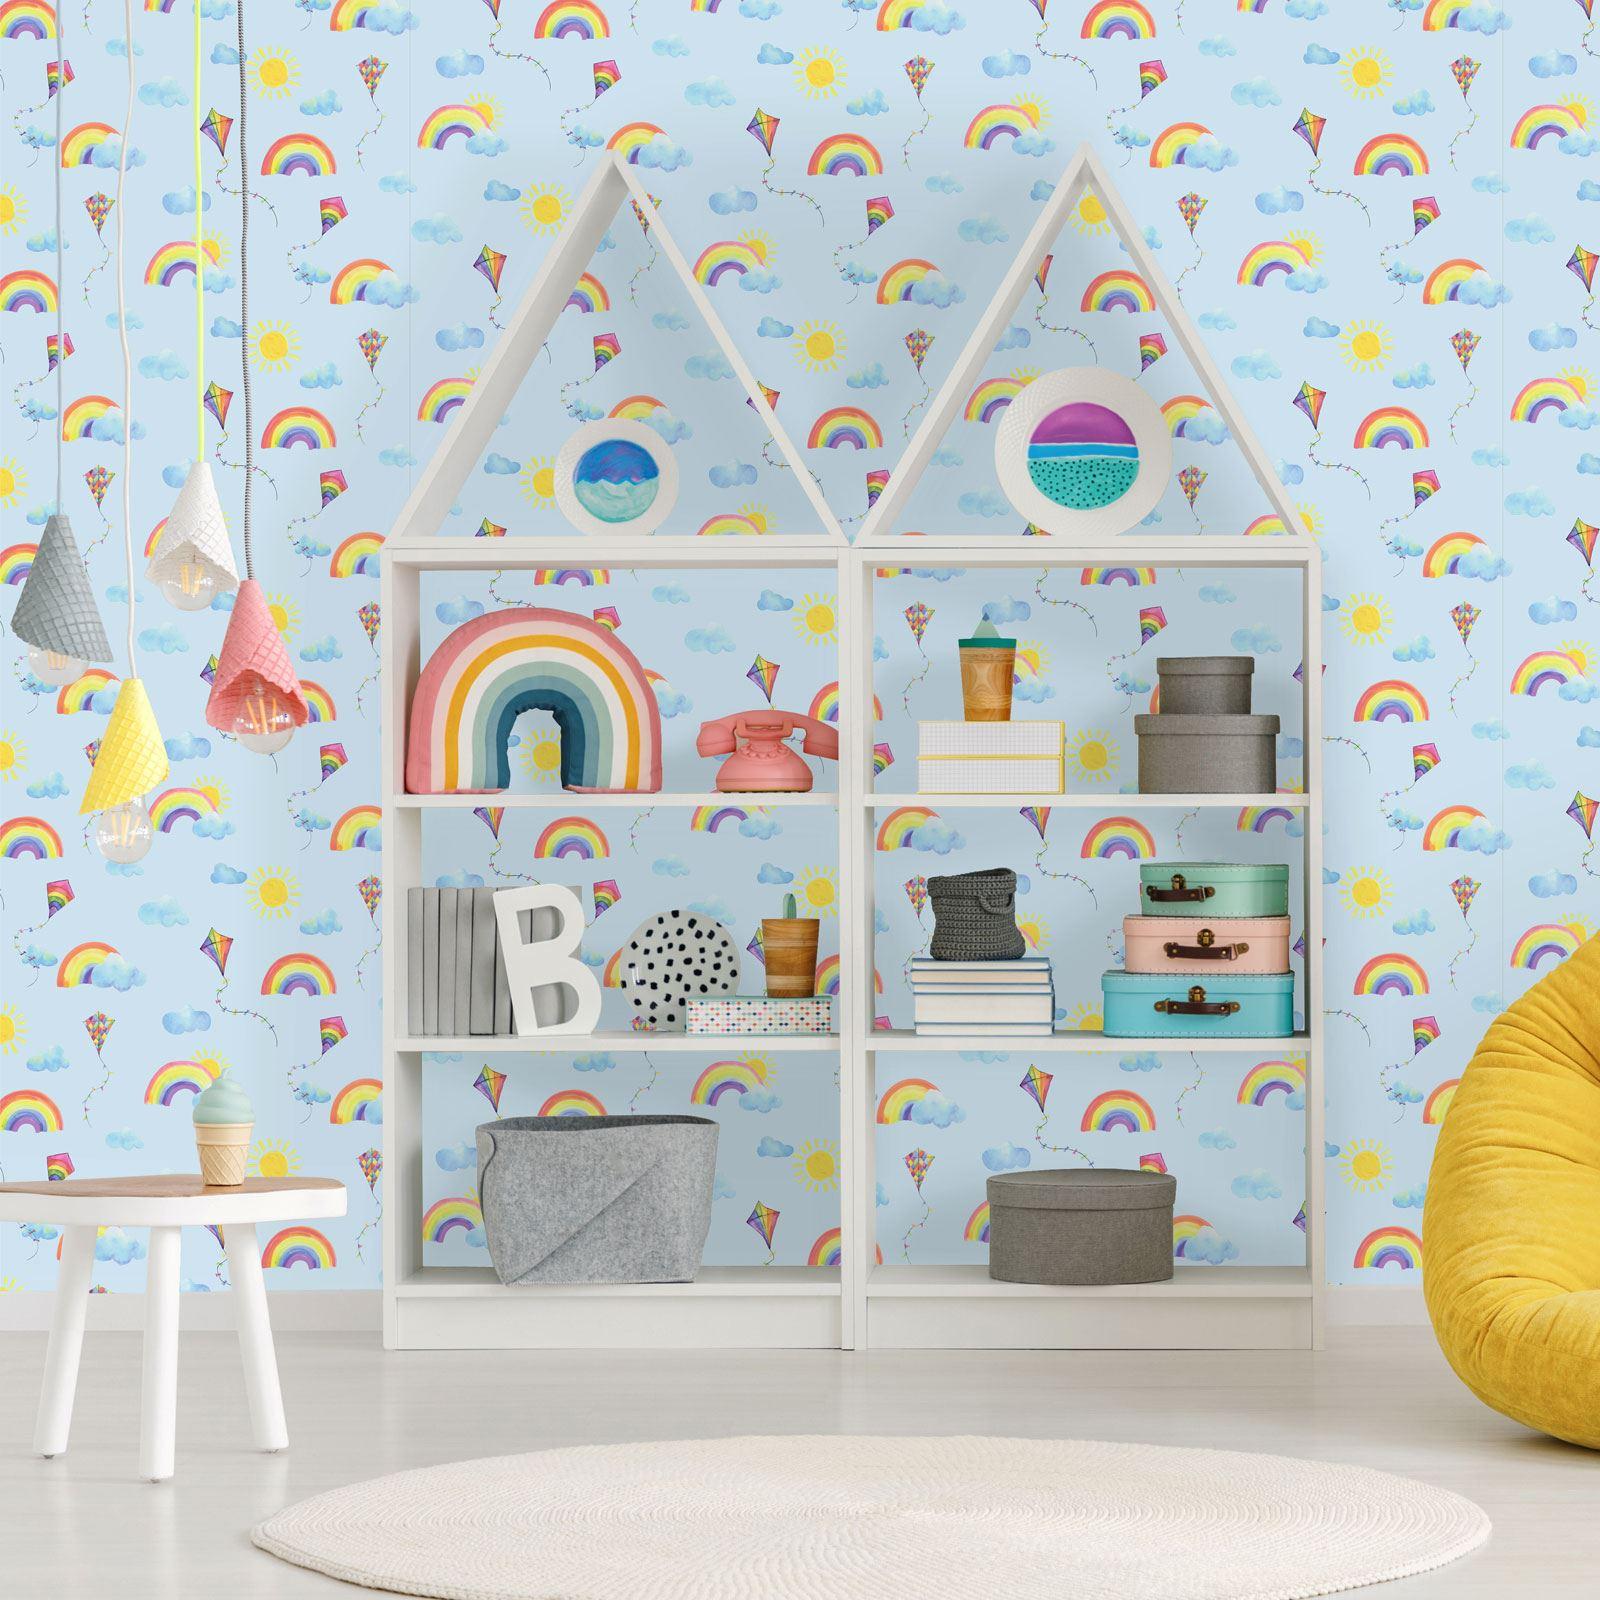 Over the Rainbow Mountains Wallpaper 91050 Boys Girls Playroom